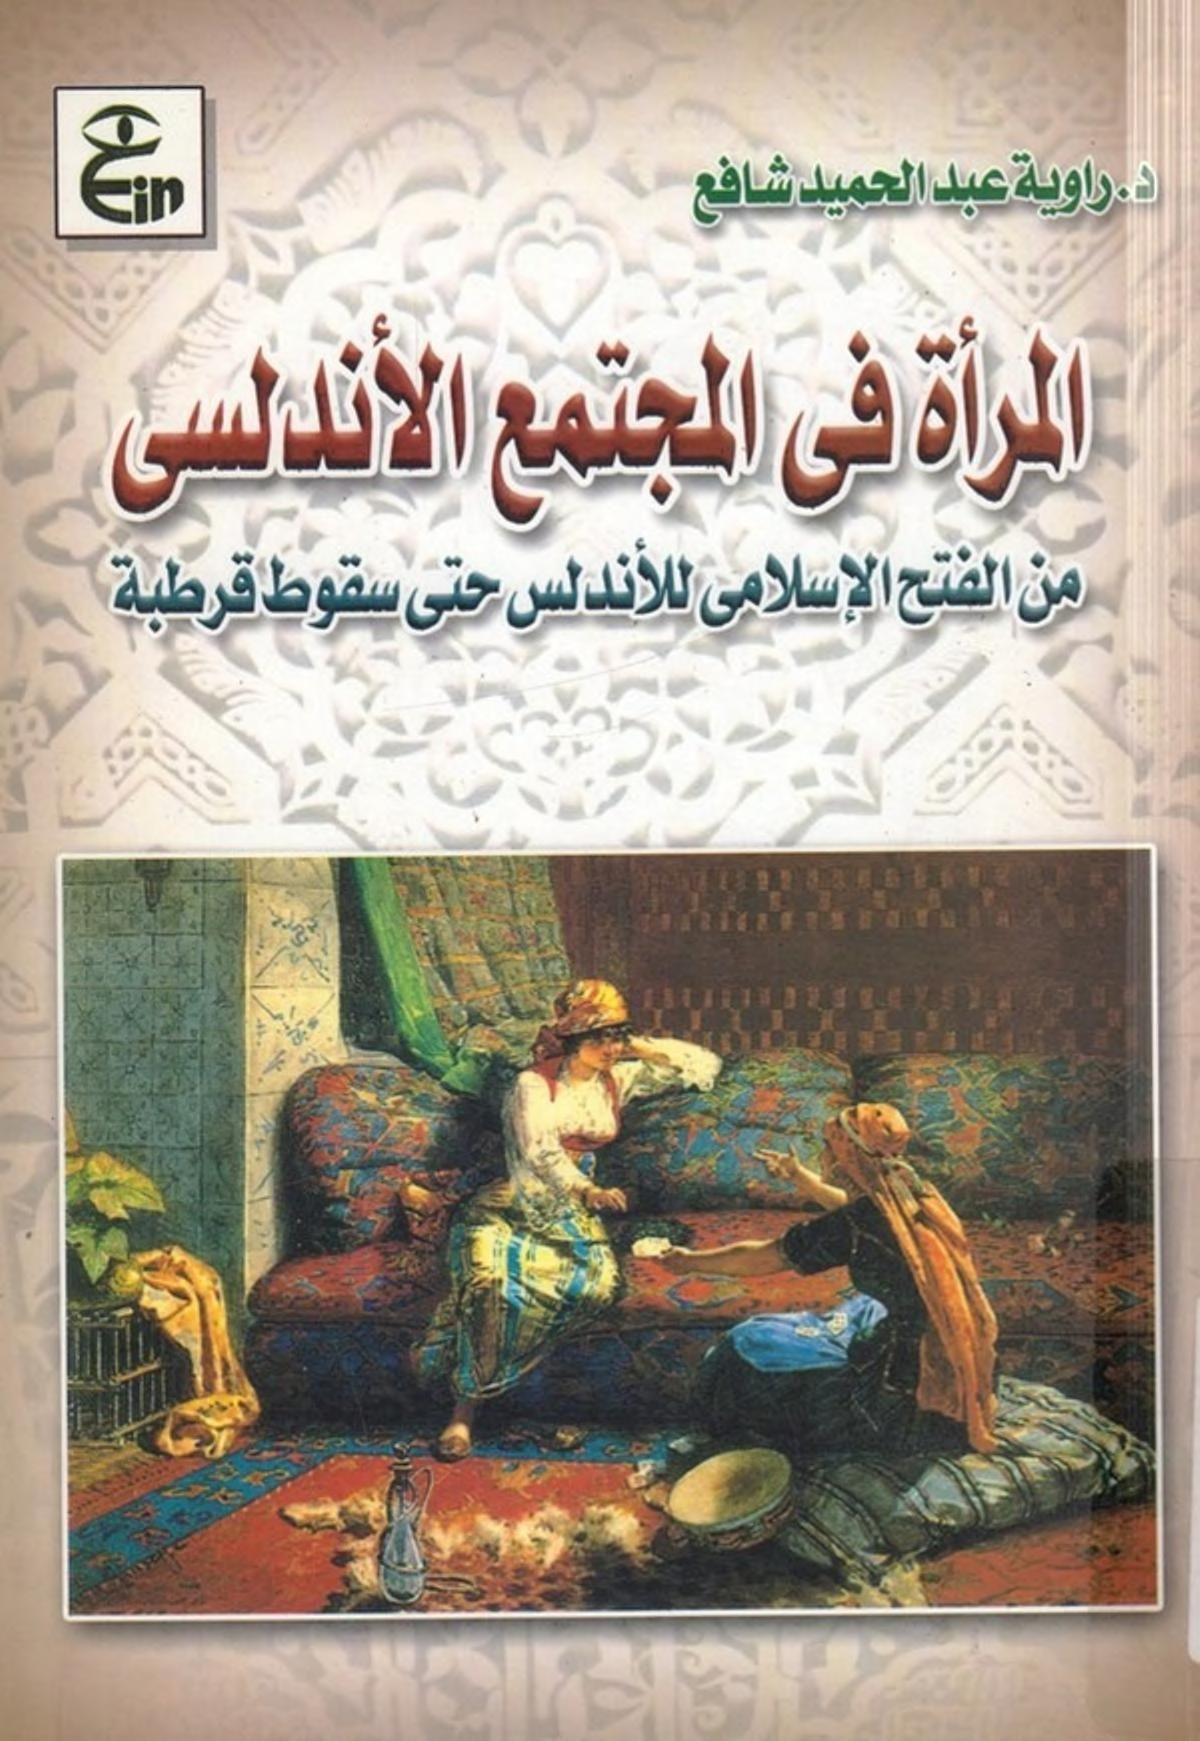 Https Archive Org Stream 23 7 18 A03171 Arabic Books Pdf Books Reading Download Books